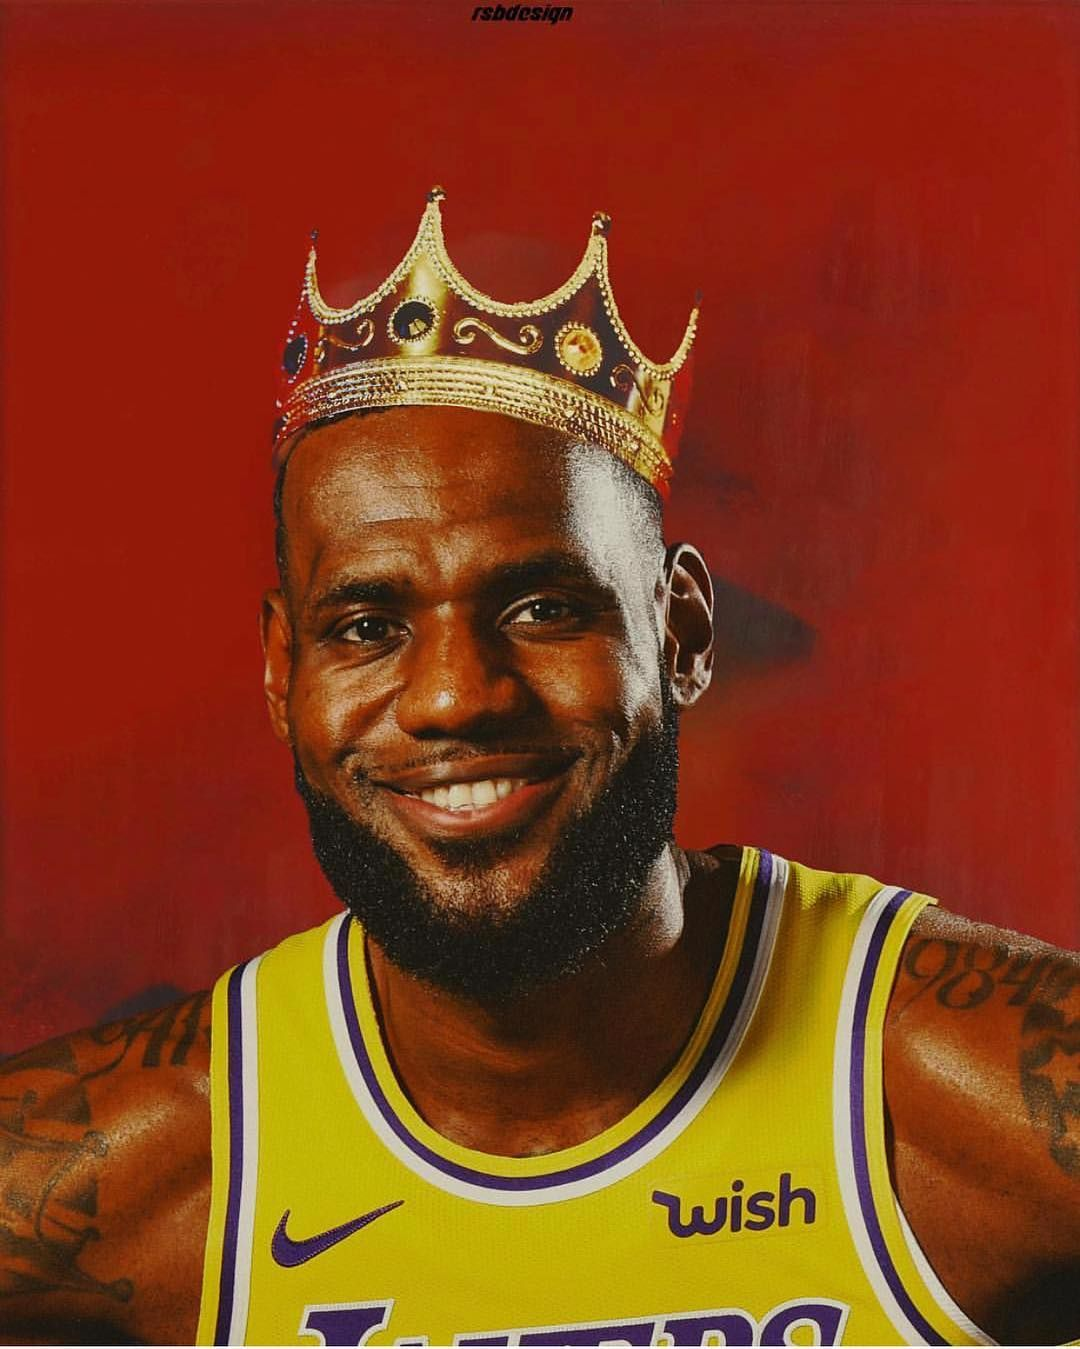 king lebron james